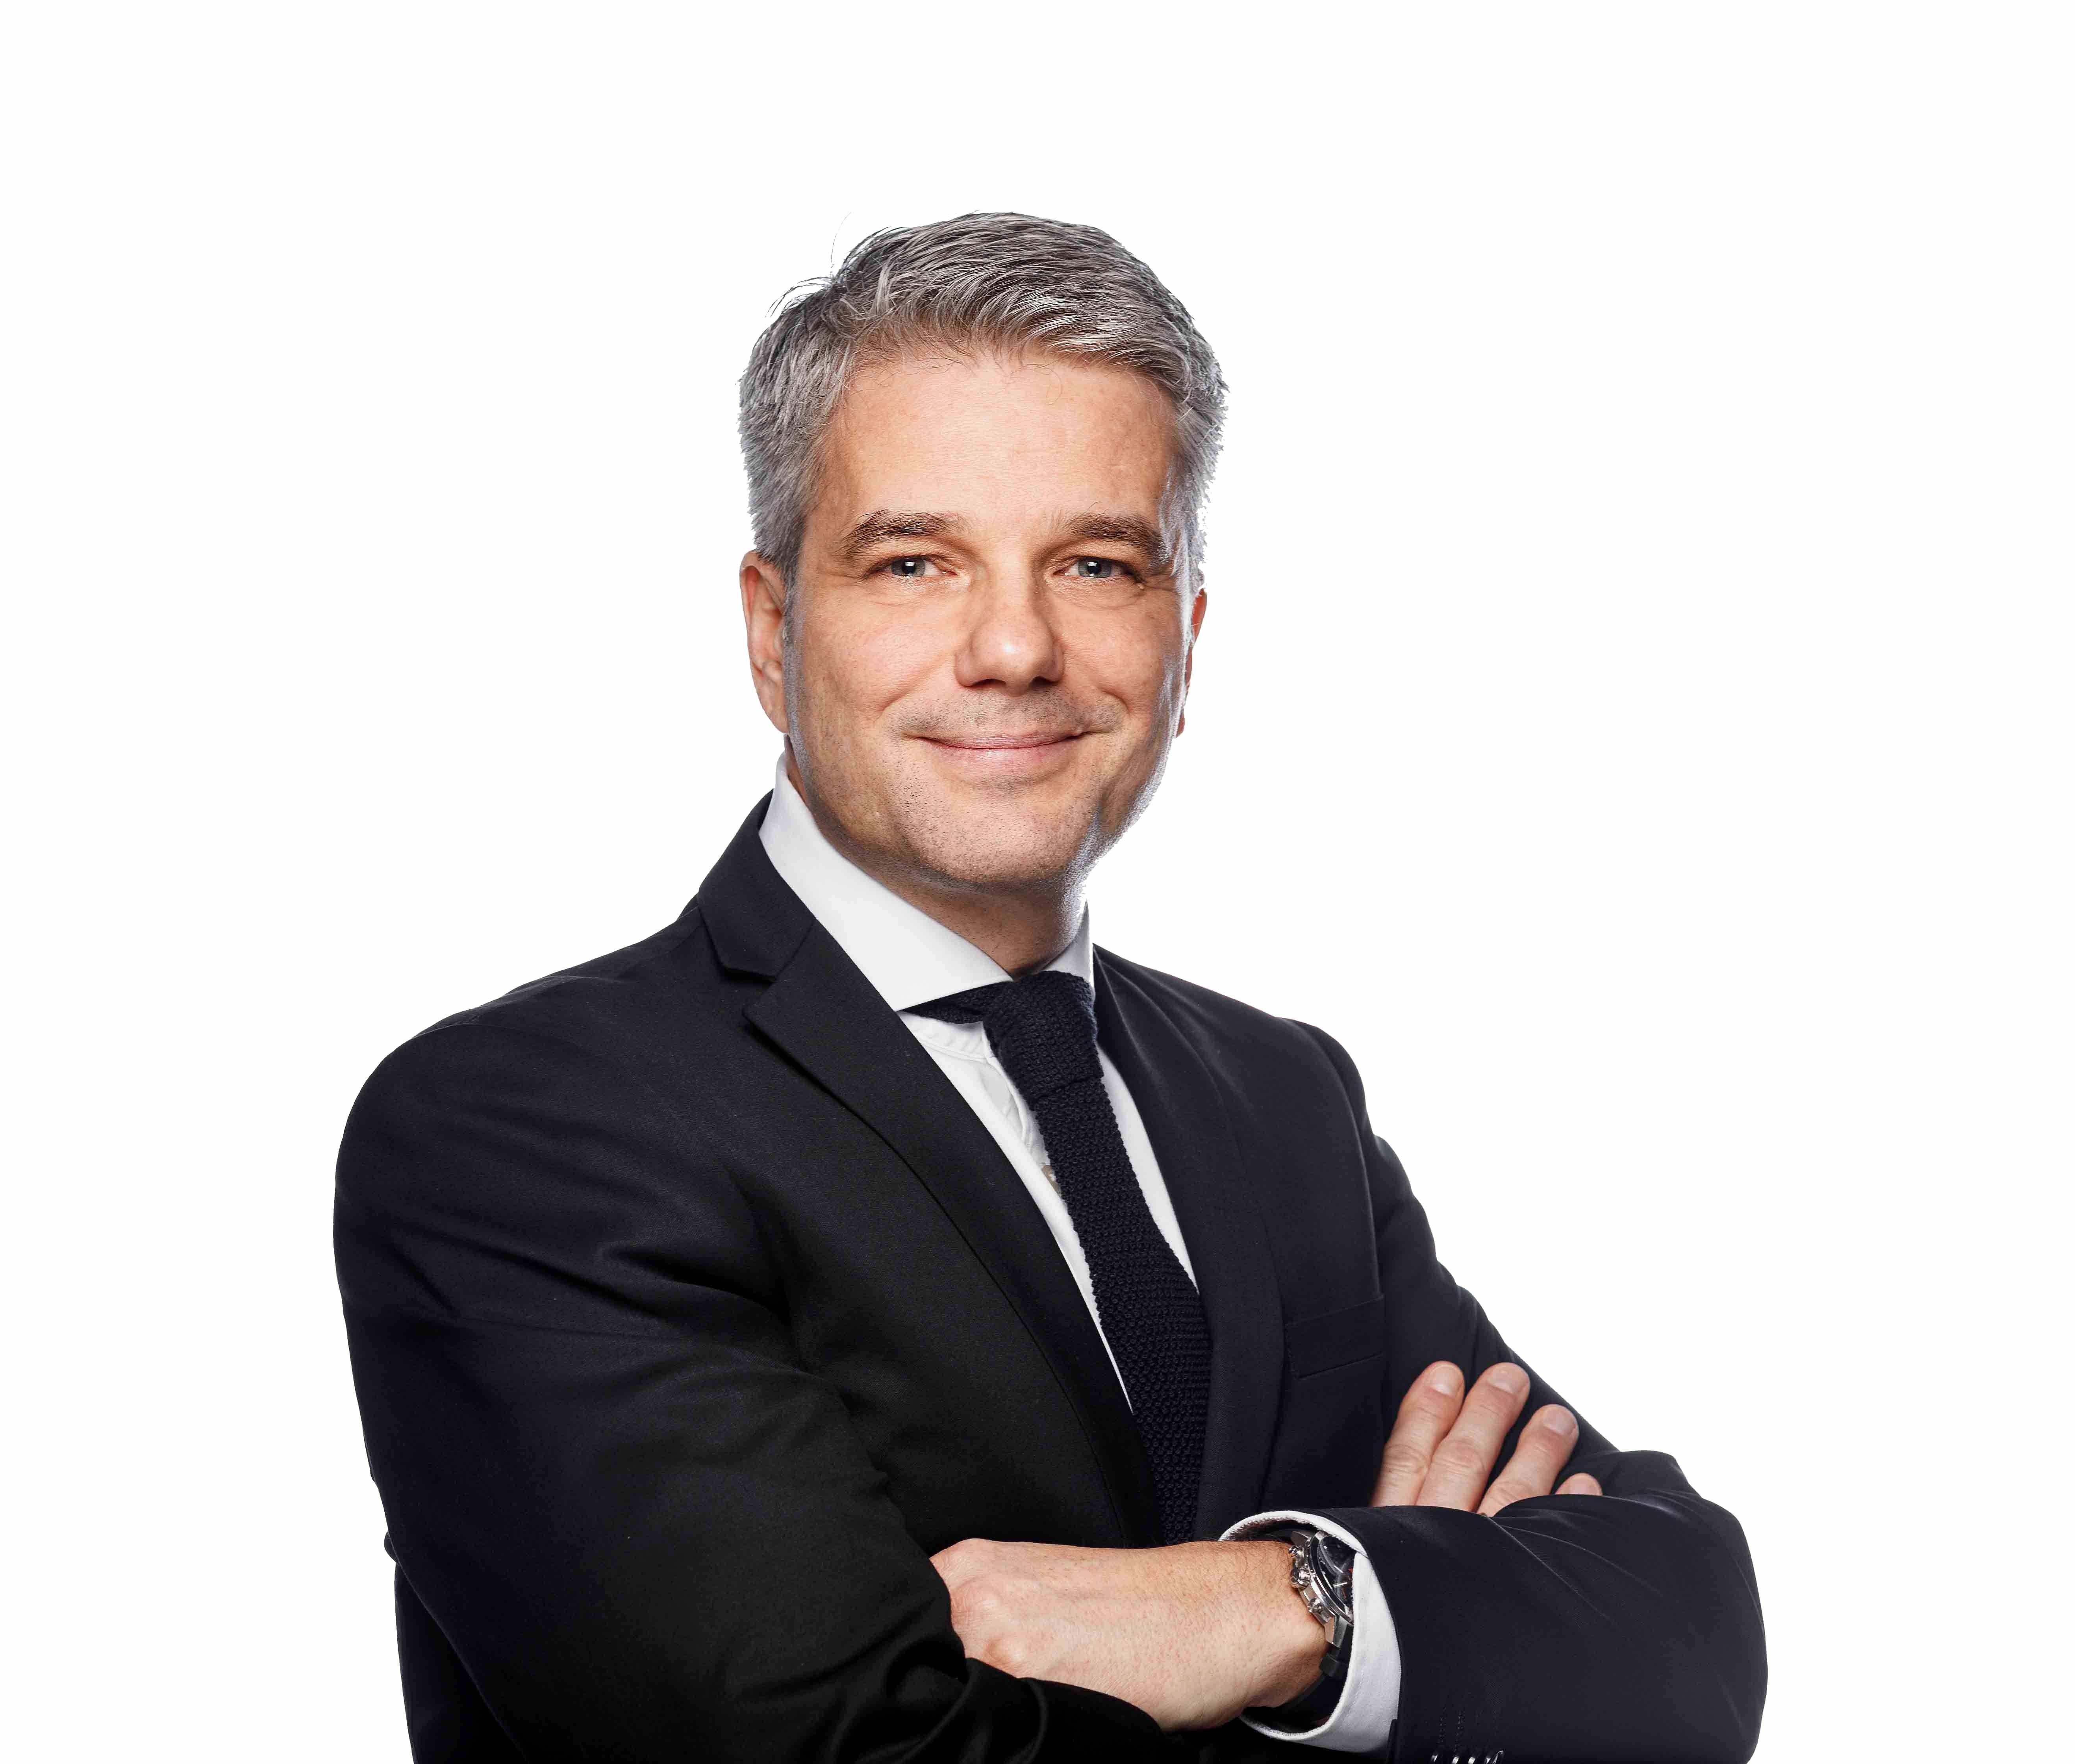 Andreas Breschan CEO Hörmann